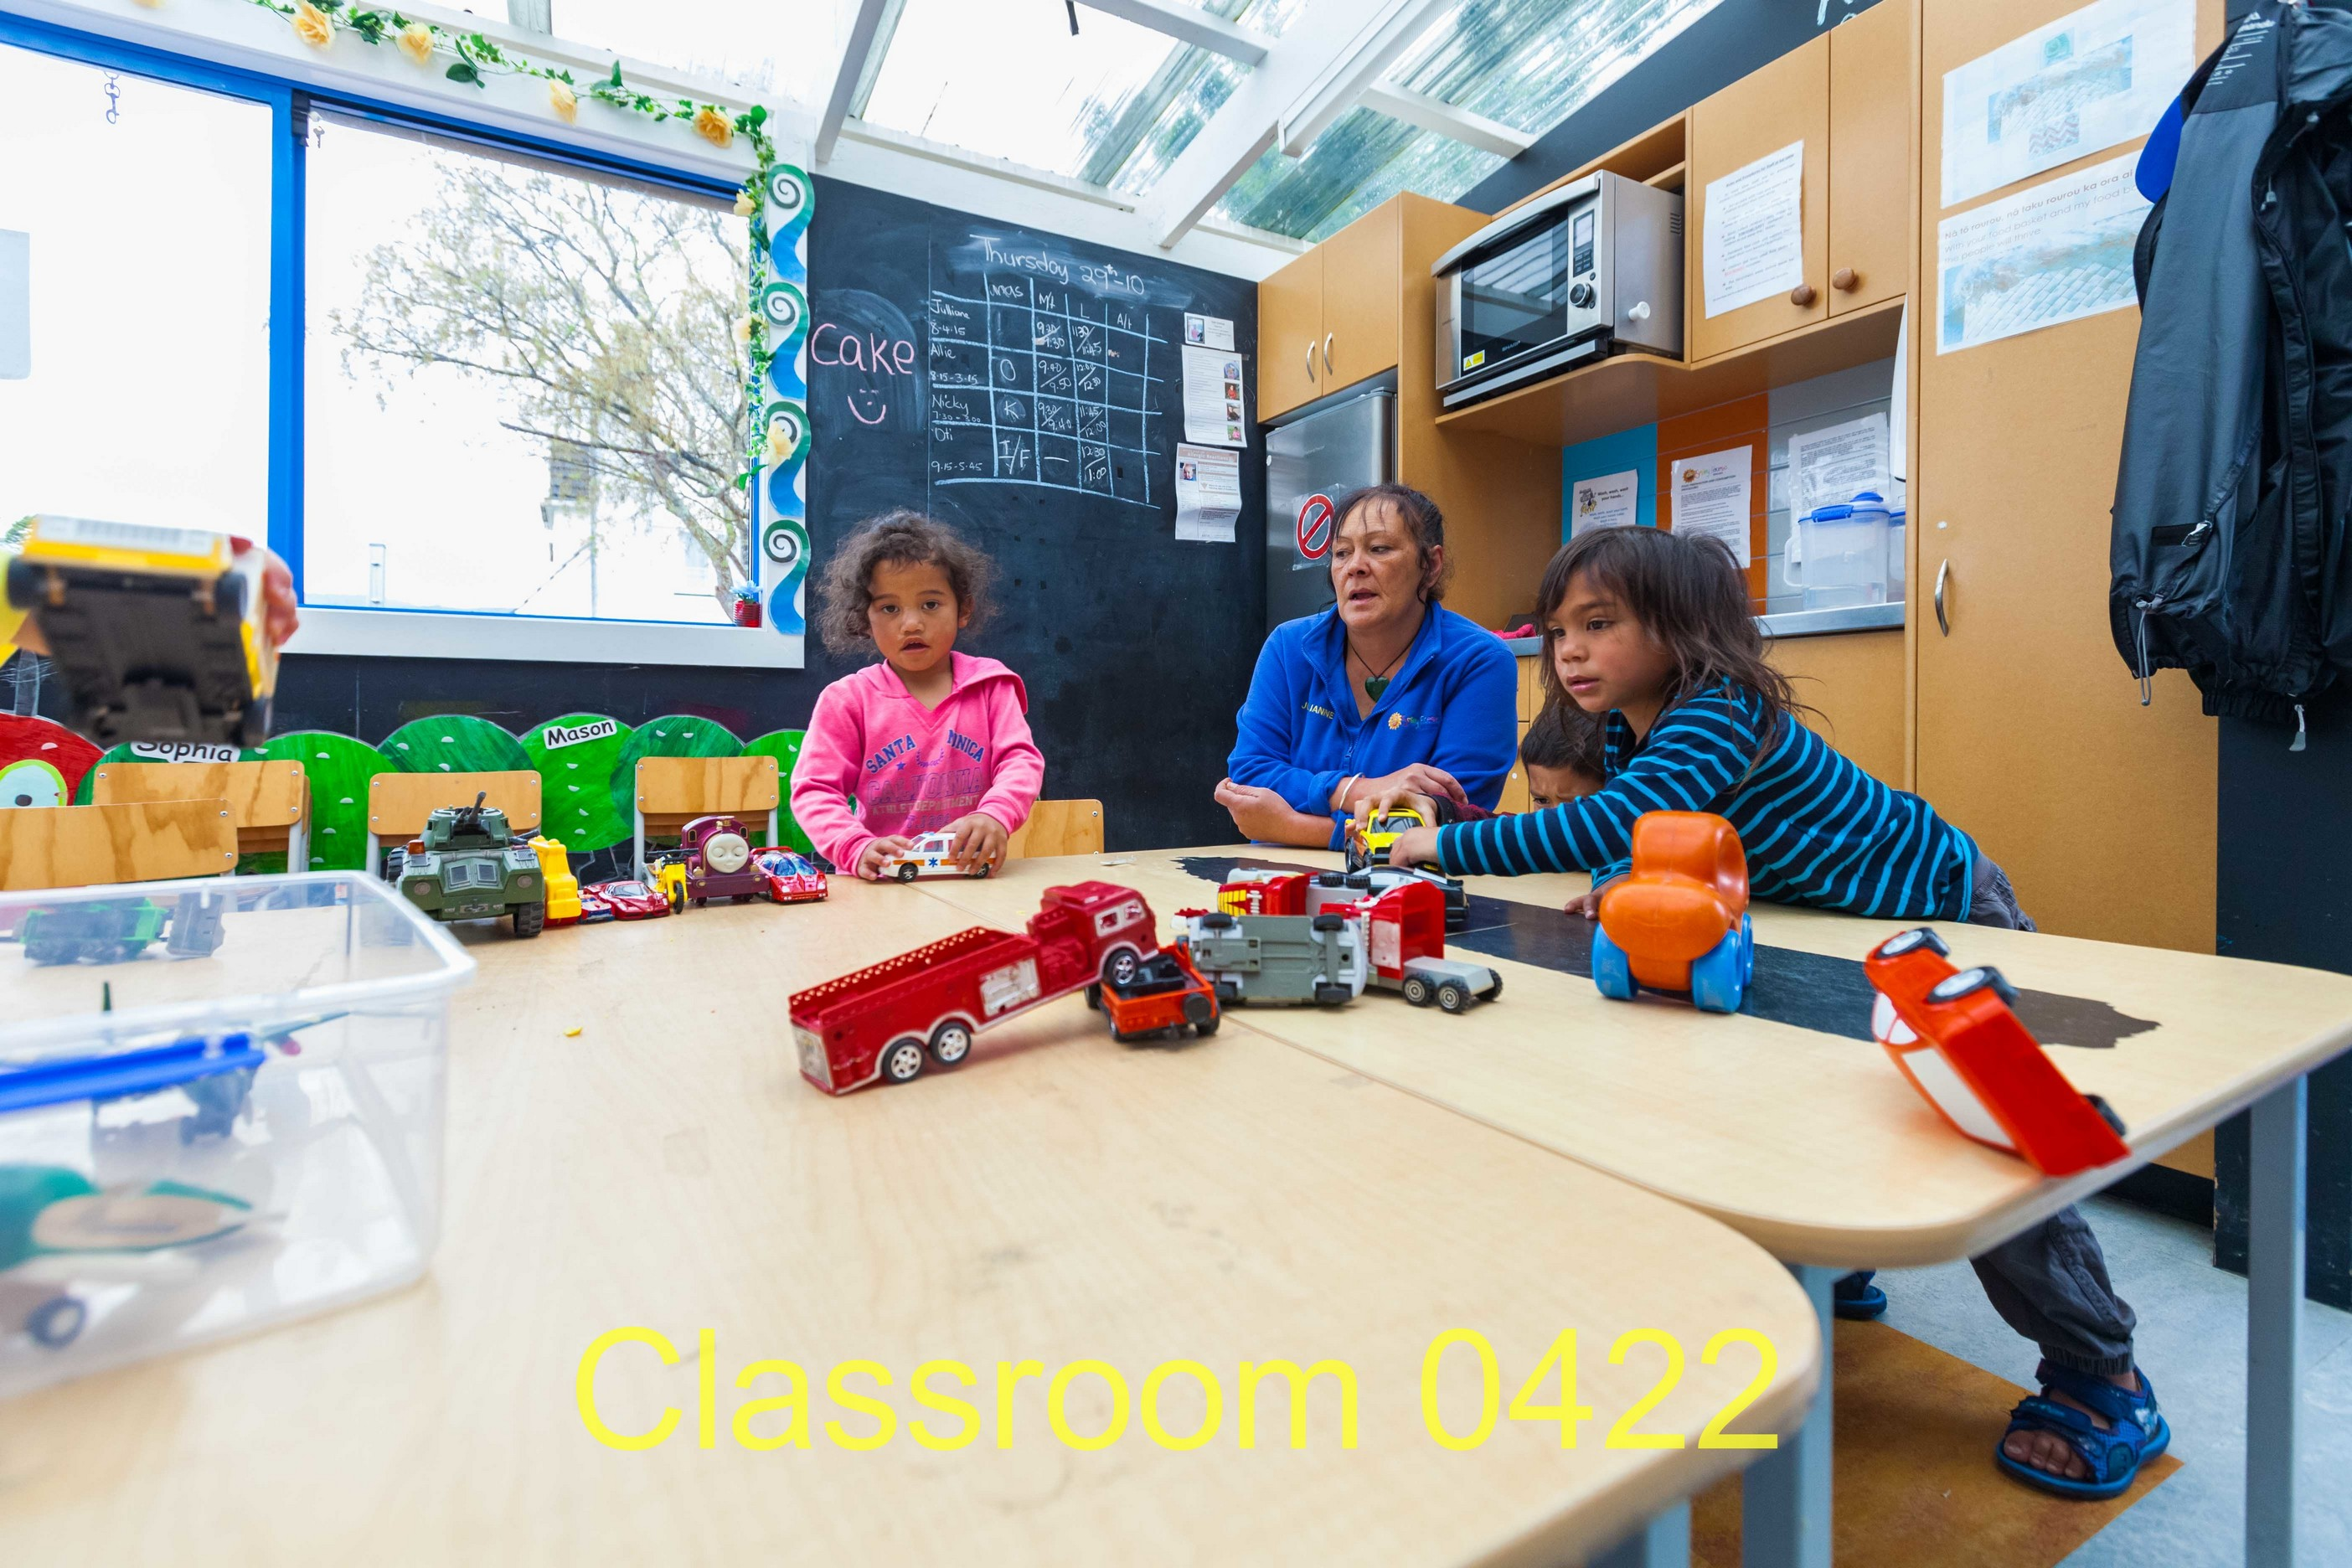 Classroom 0422